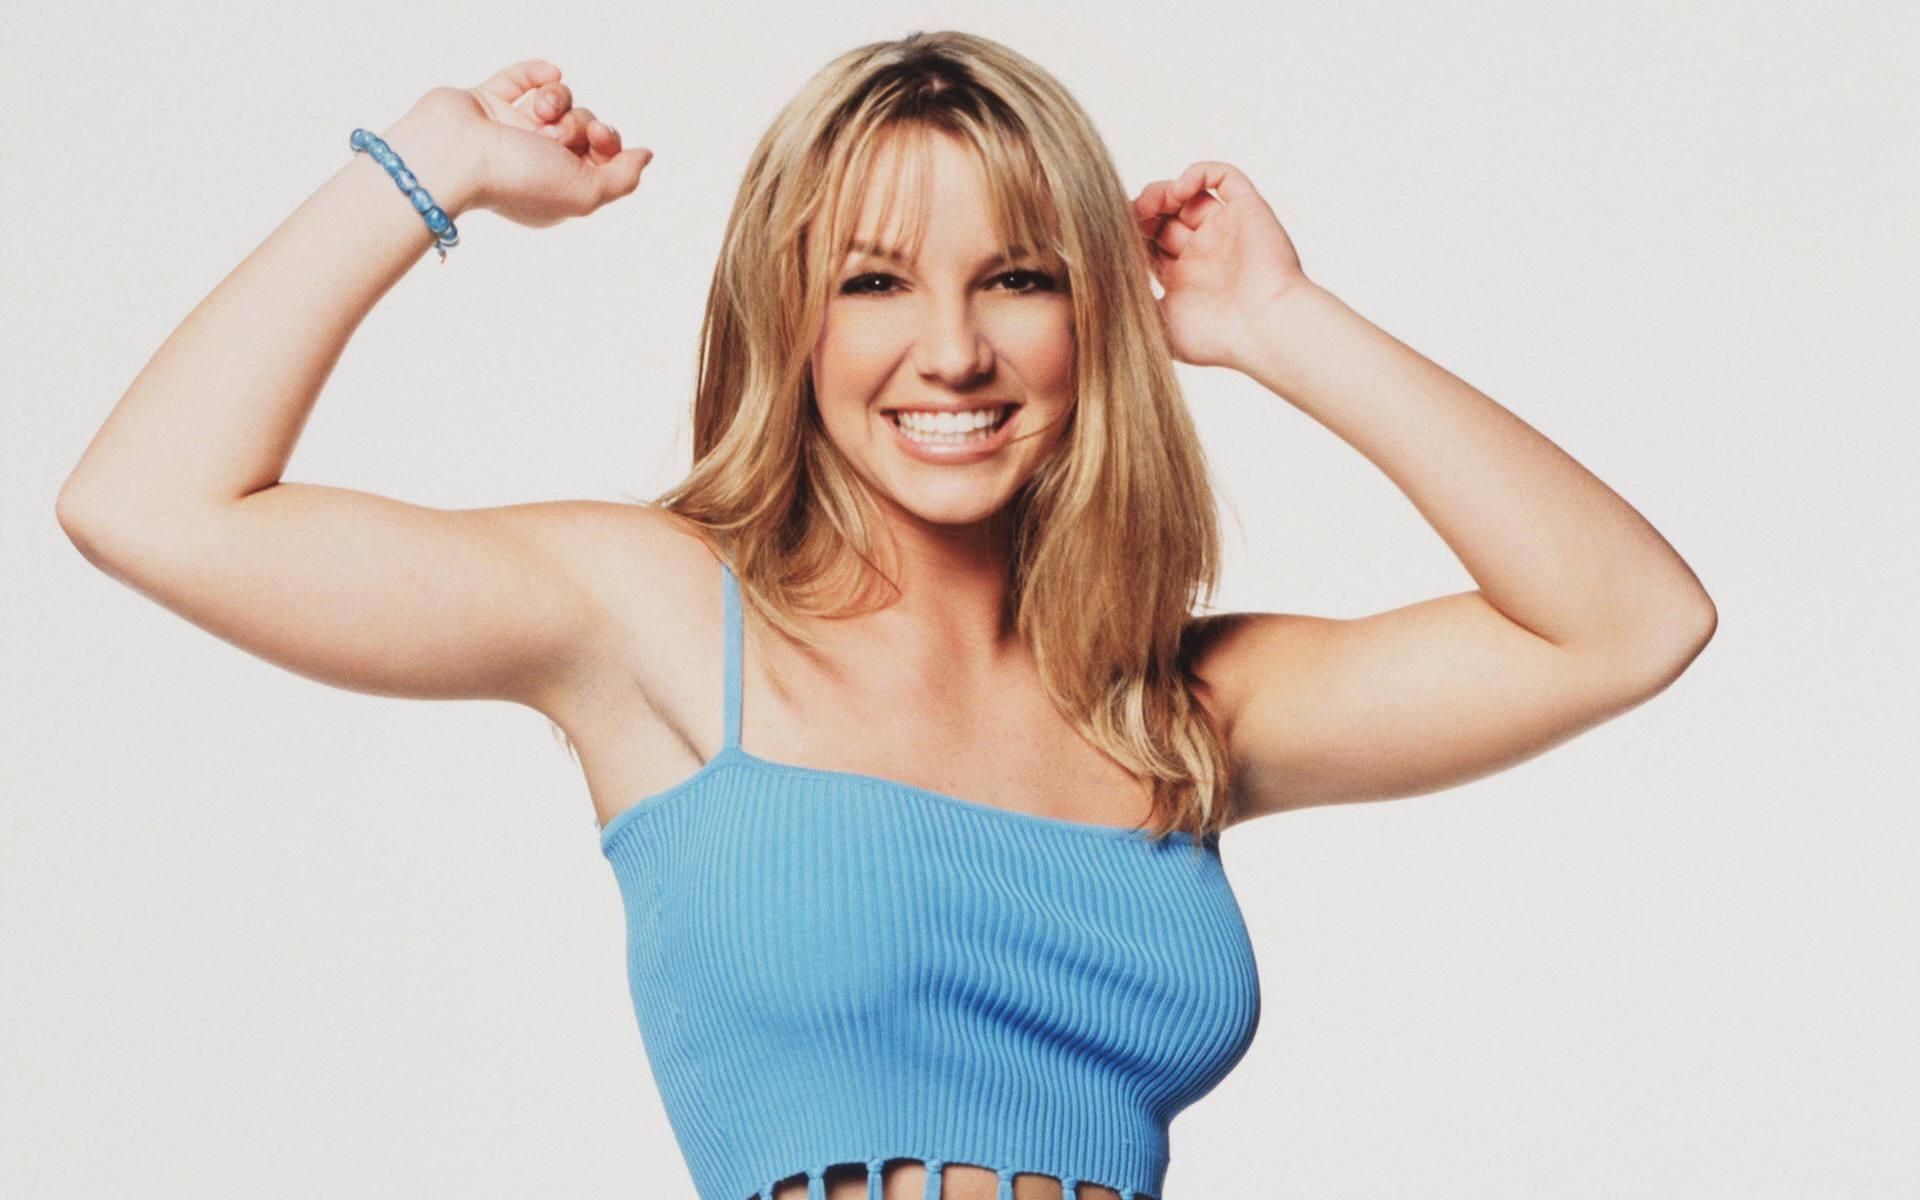 Britney Spears posts nearly nude bathroom selfie | Talesbuzz